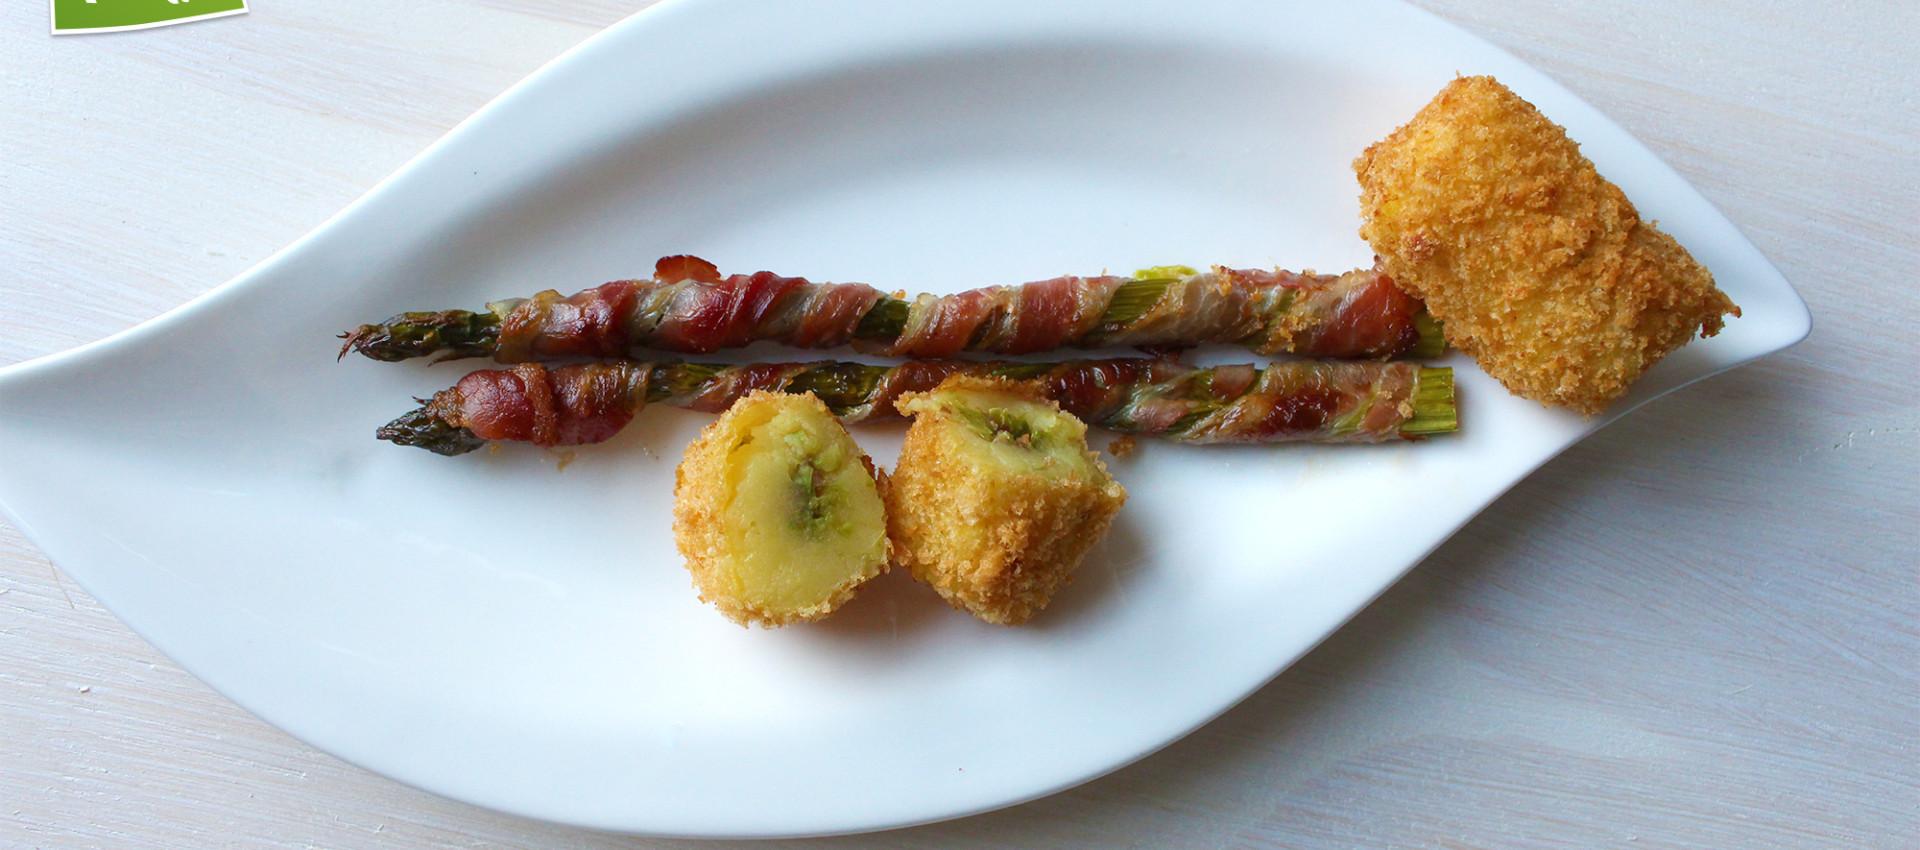 Rezept gegrillter grüner Spargel, Bacon, Kroketten von KochBock.de